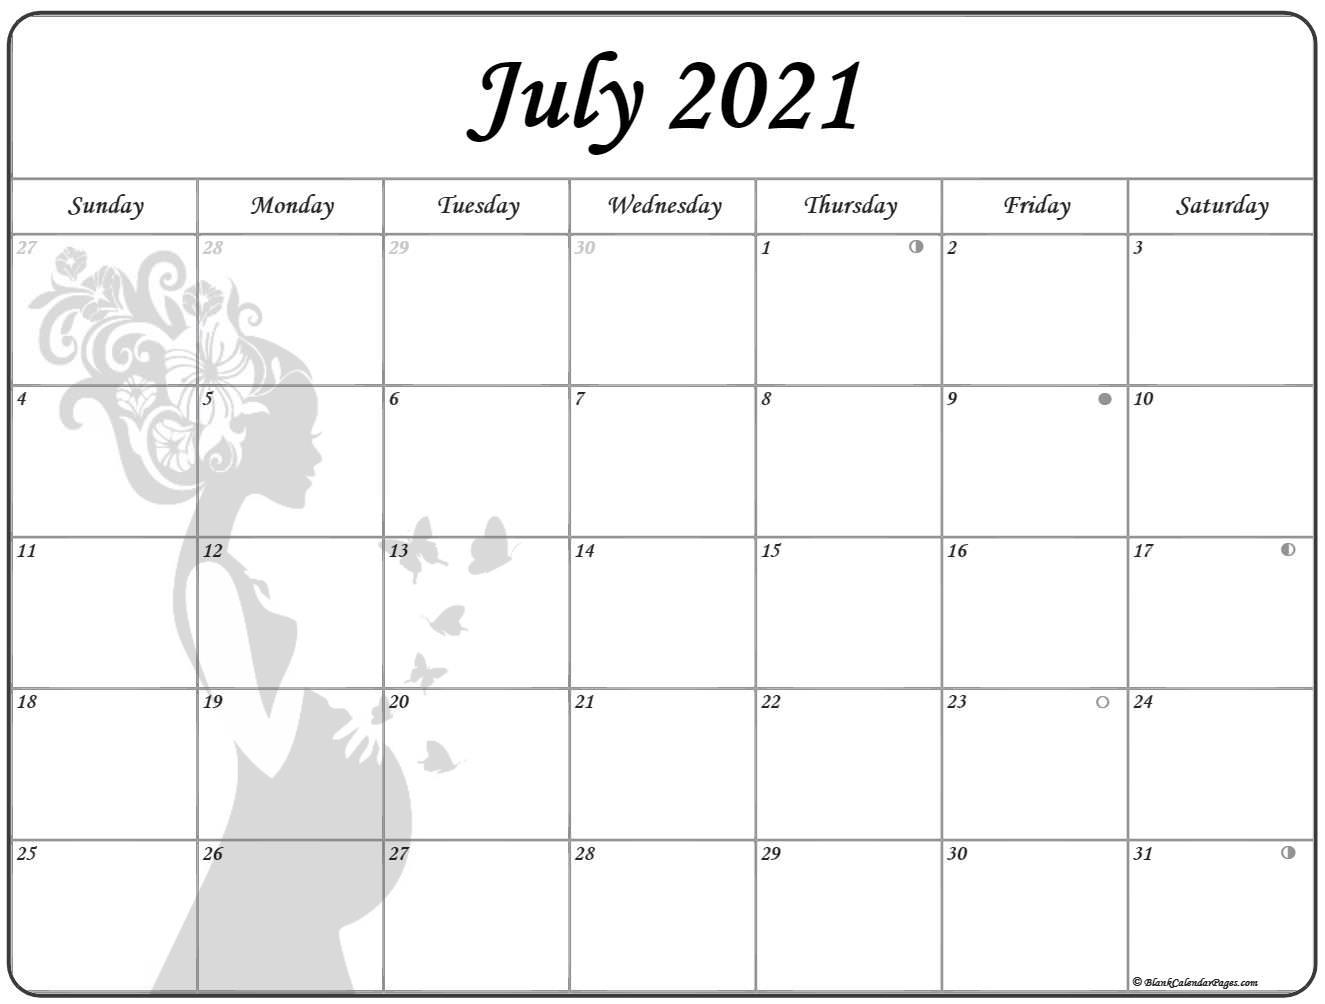 July 2021 Pregnancy Calendar | Fertility Calendar July 2020 To December 2021 Calendar